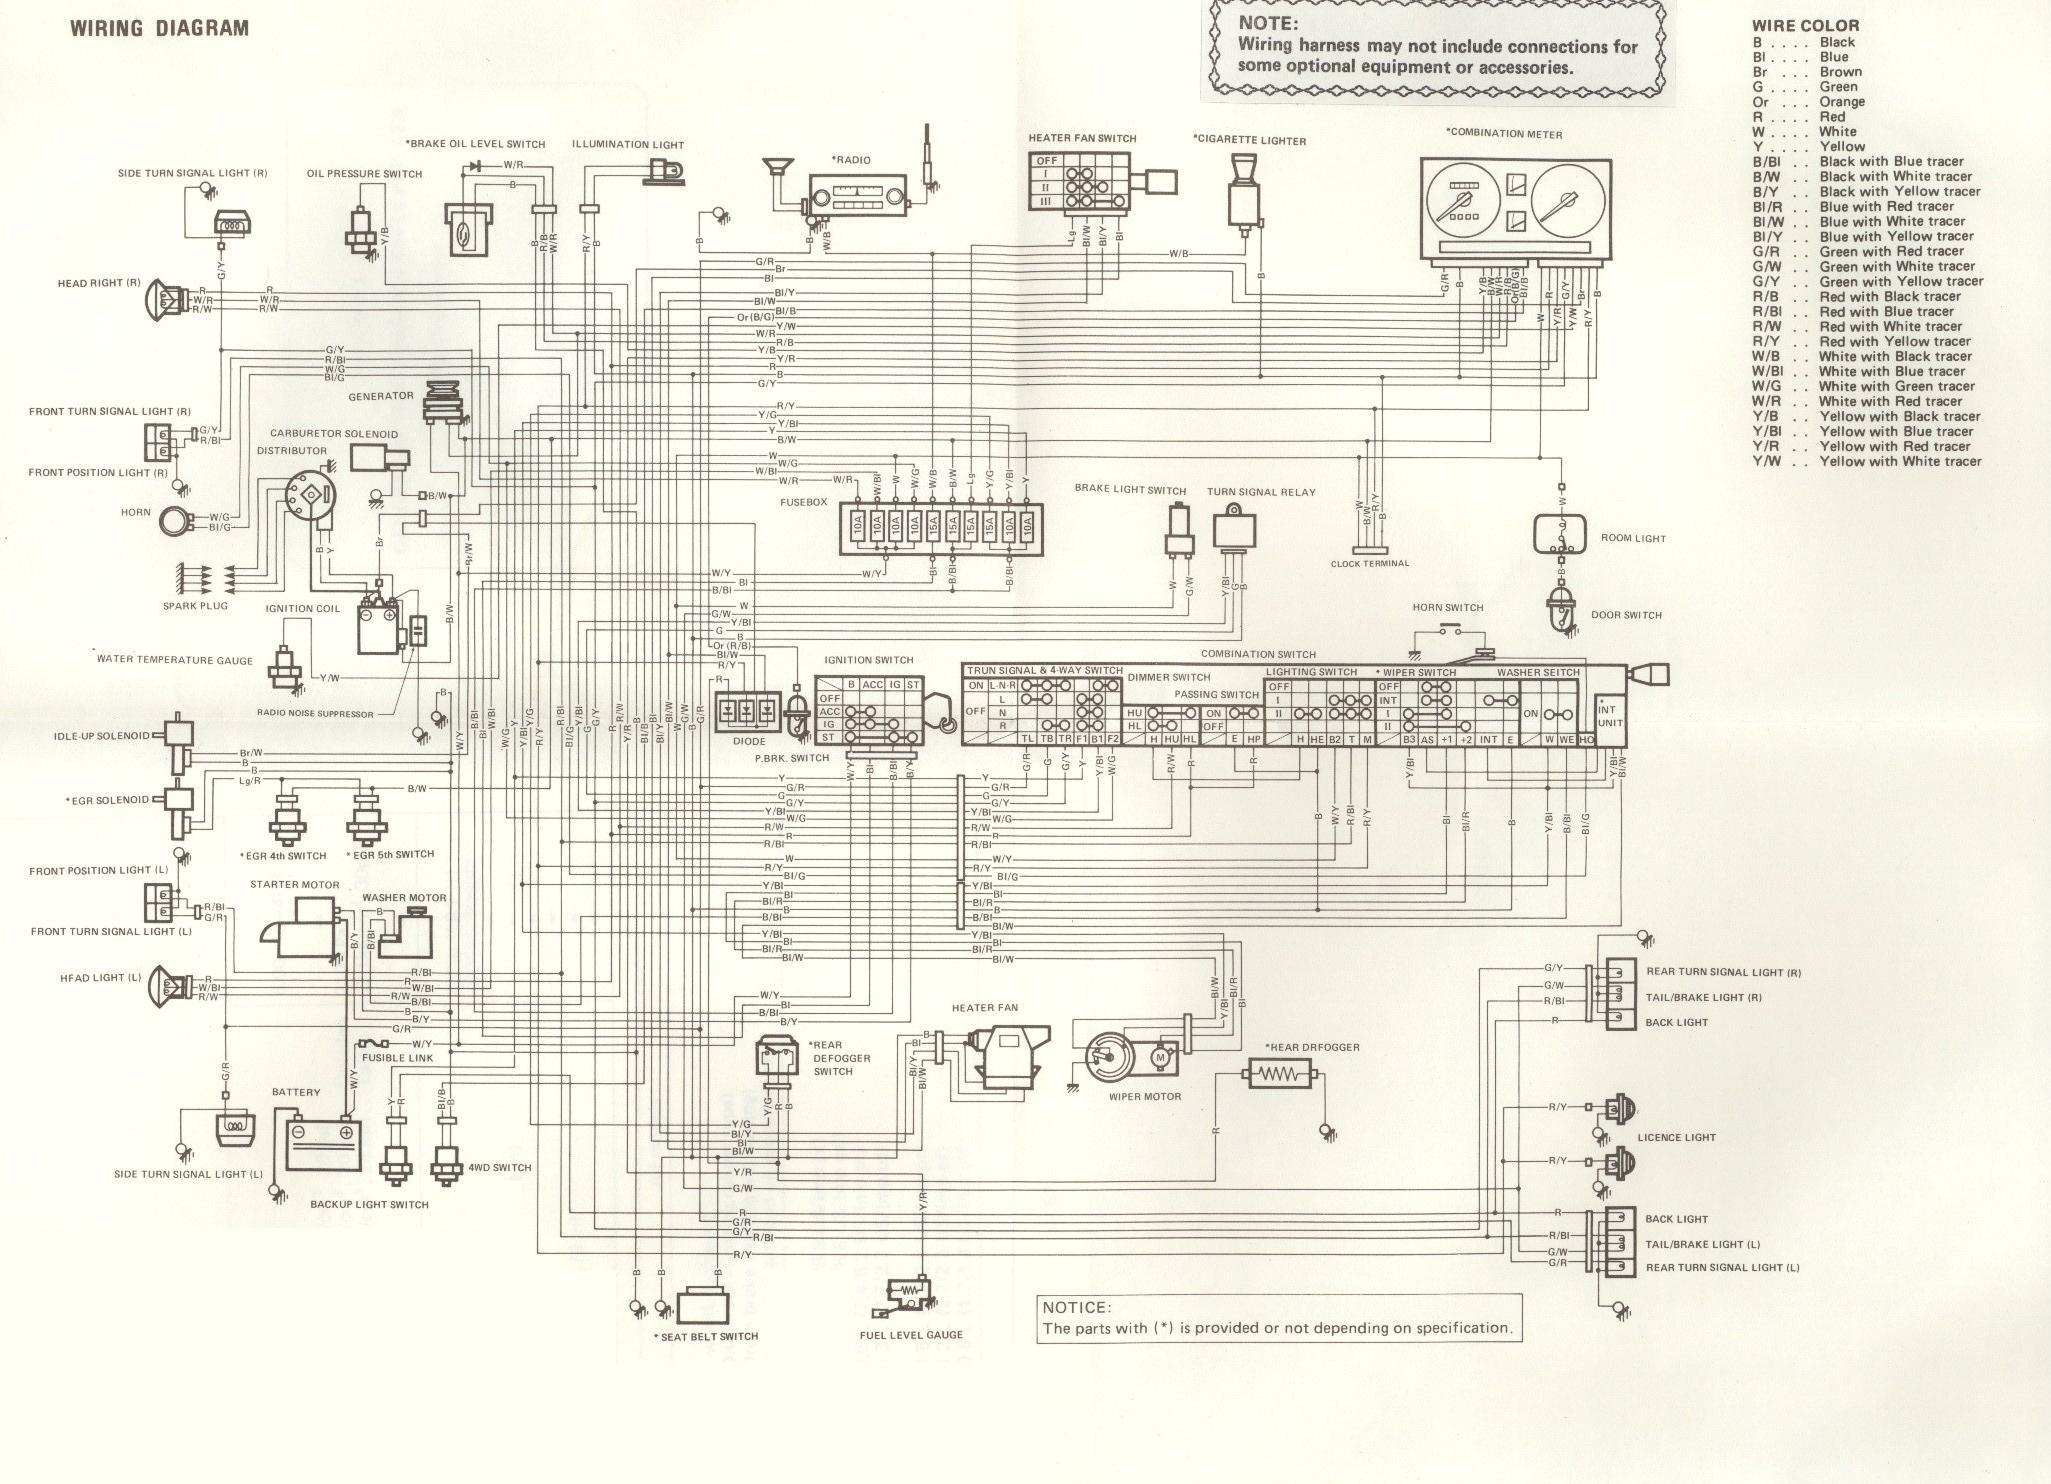 1988 Suzuki Samurai Ignition Wiring Diagram: Awesome 1987 Suzuki Samurai  Wiring Diagram Images - Electrical